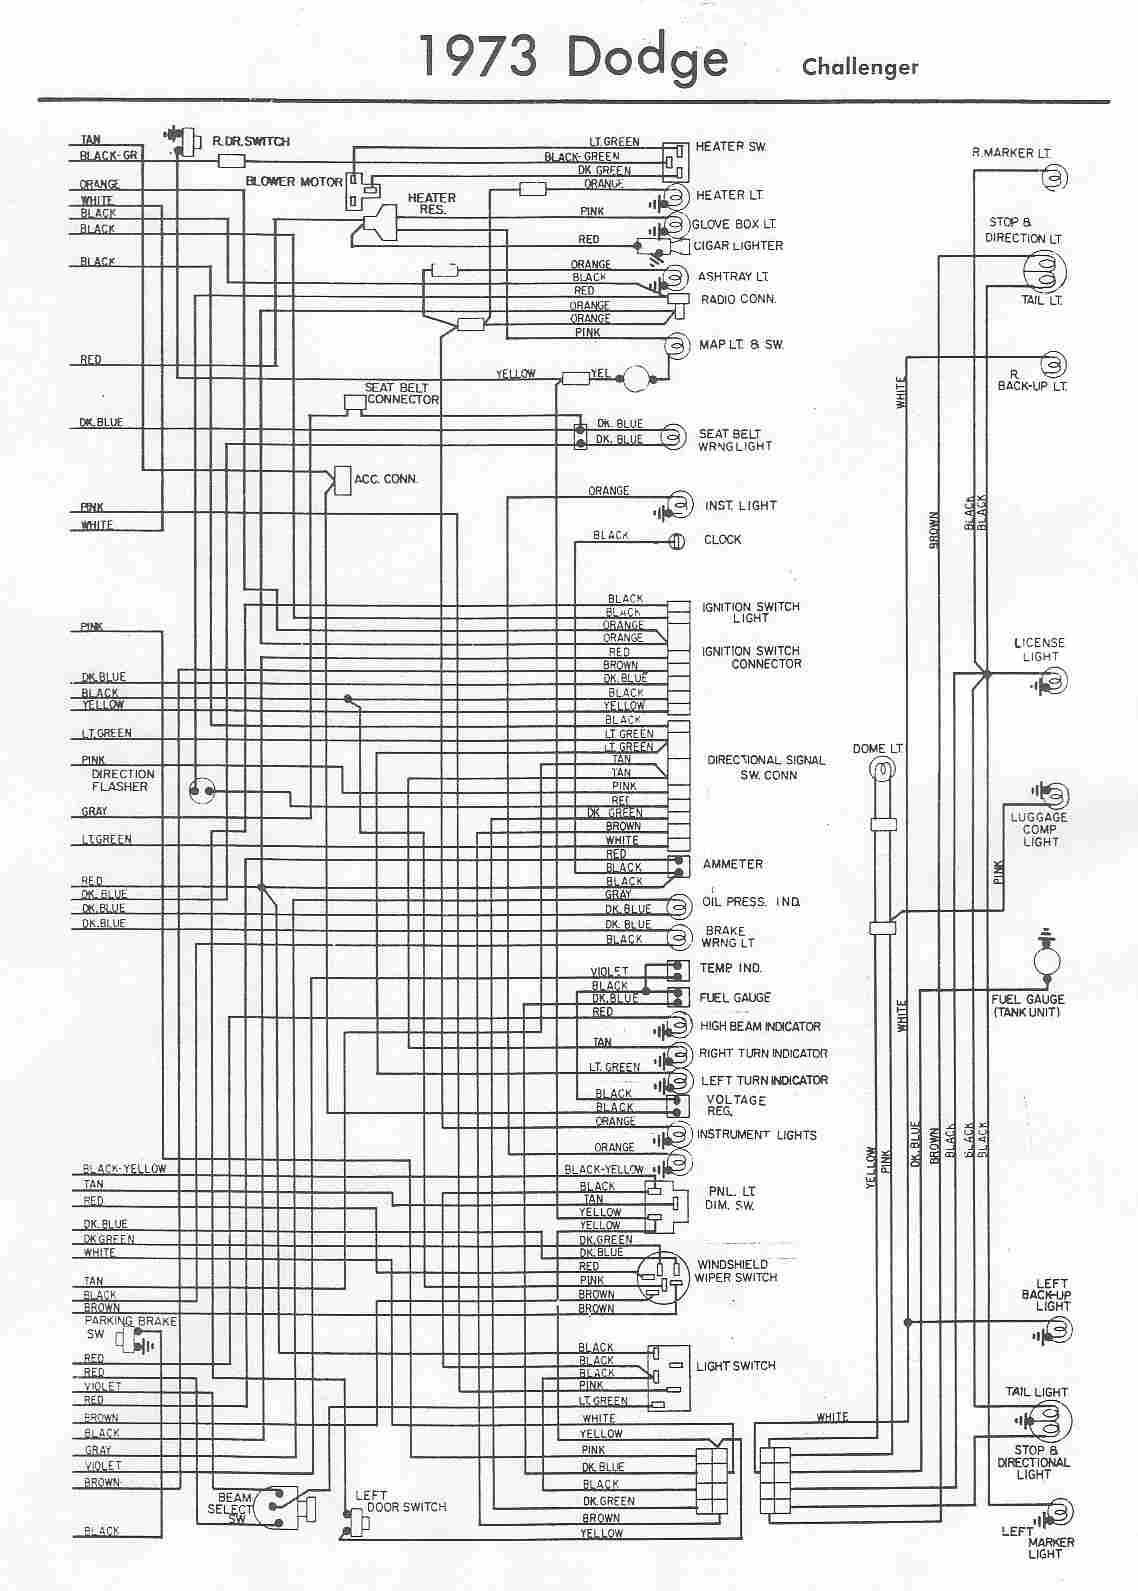 1973 dodge challenger dash wiring harness trusted wiring diagram u2022 rh soulmatestyle co 2006 Dodge Charger Fuse Box 2006 Dodge Charger Wiring Diagram